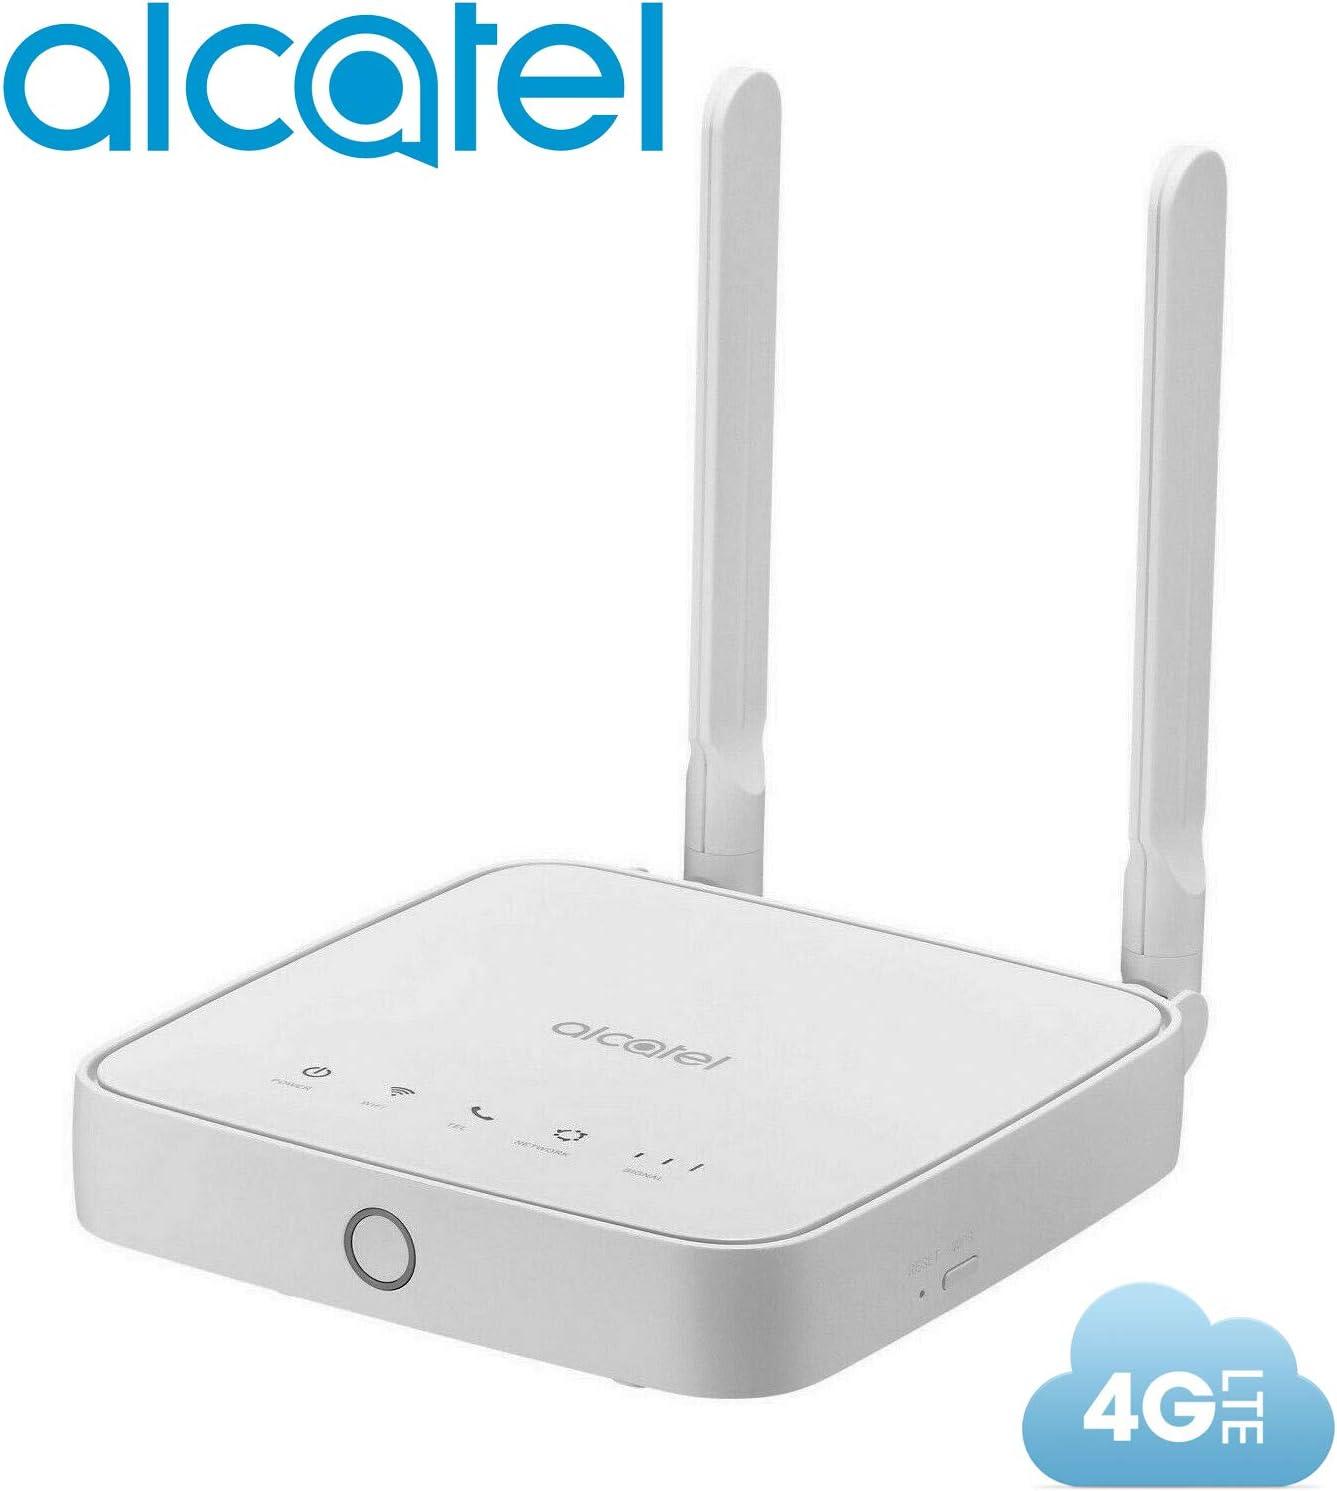 Router Alcatel Link Hub 4G LTE desbloqueado en todo el mundo HH41NH Multibam 150 Mbps Wi-Fi (4G LTE EE. UU. América Latina Caribe Europa África ...